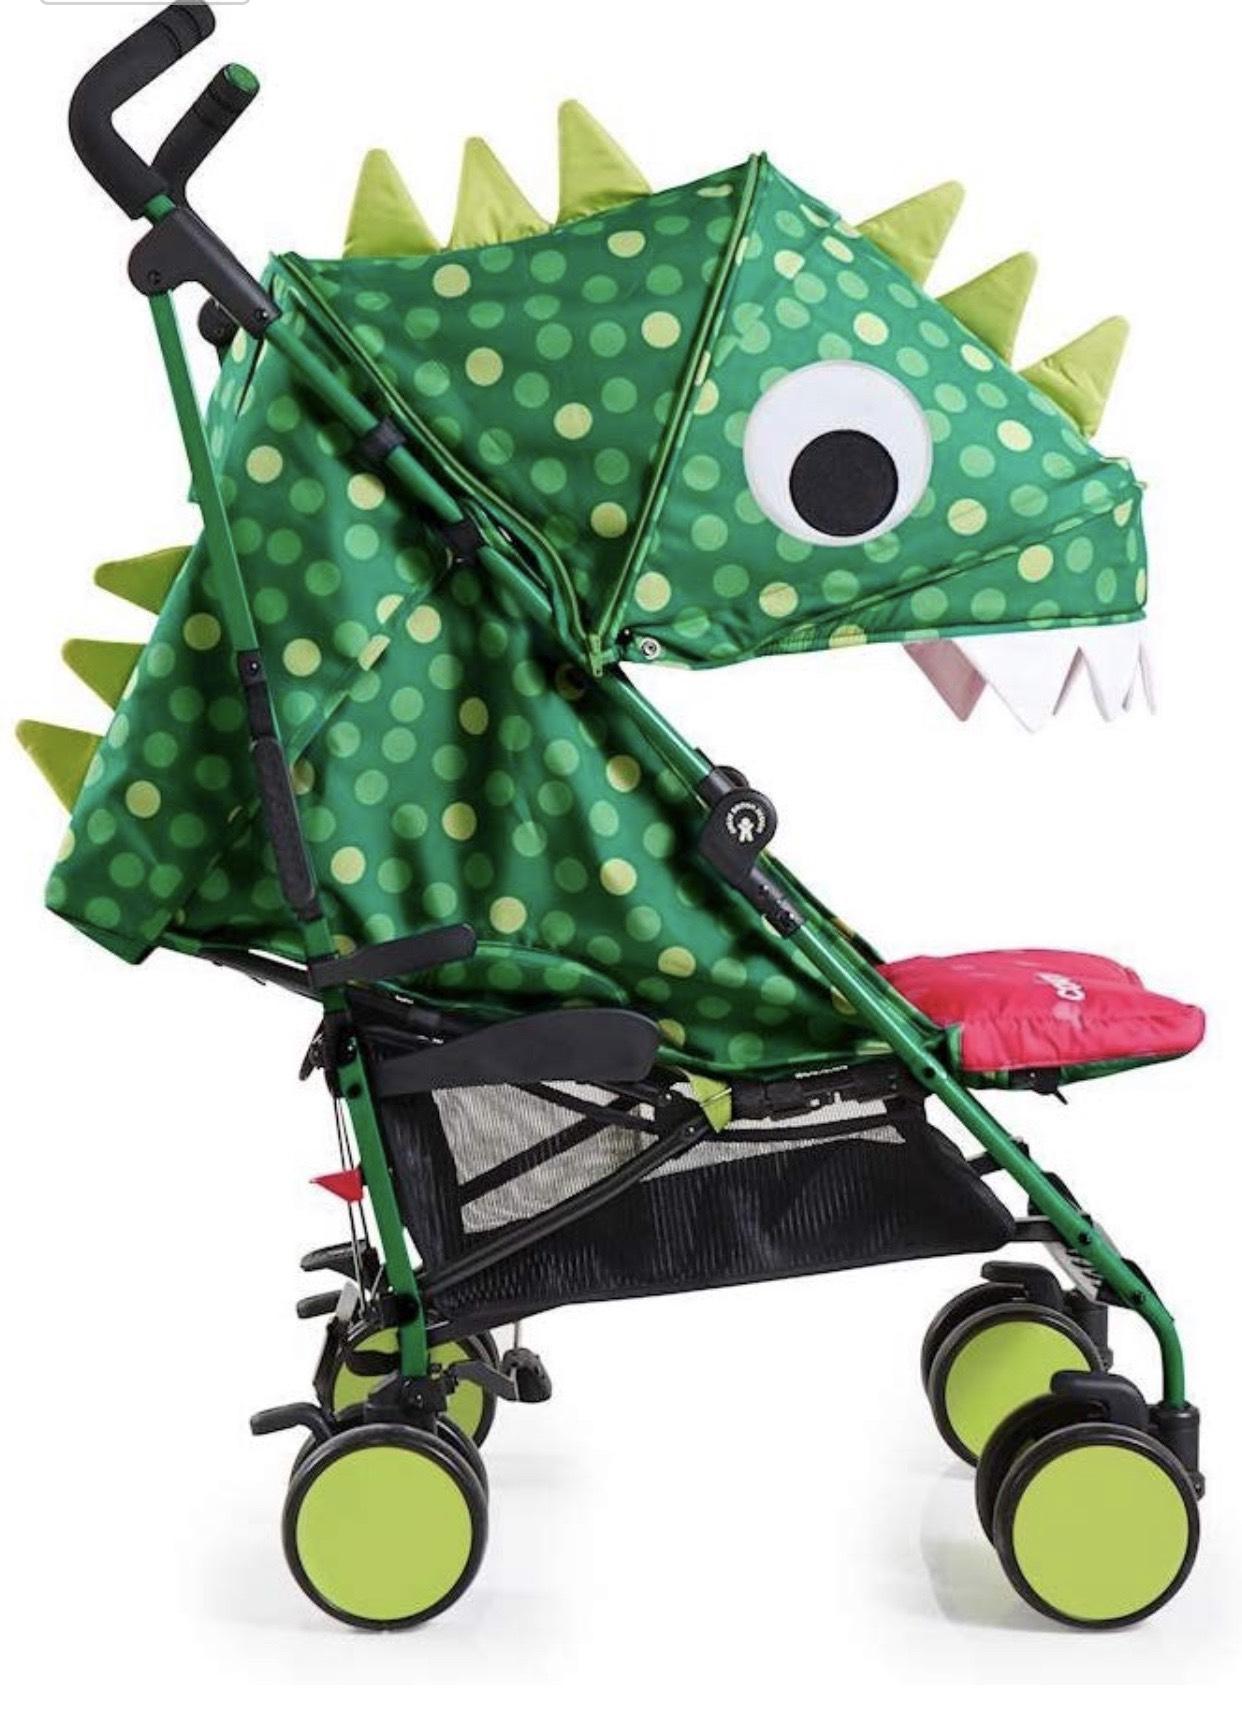 Cosatto Supa 2018 Stroller Dino Mighty £89.99 @ amazon